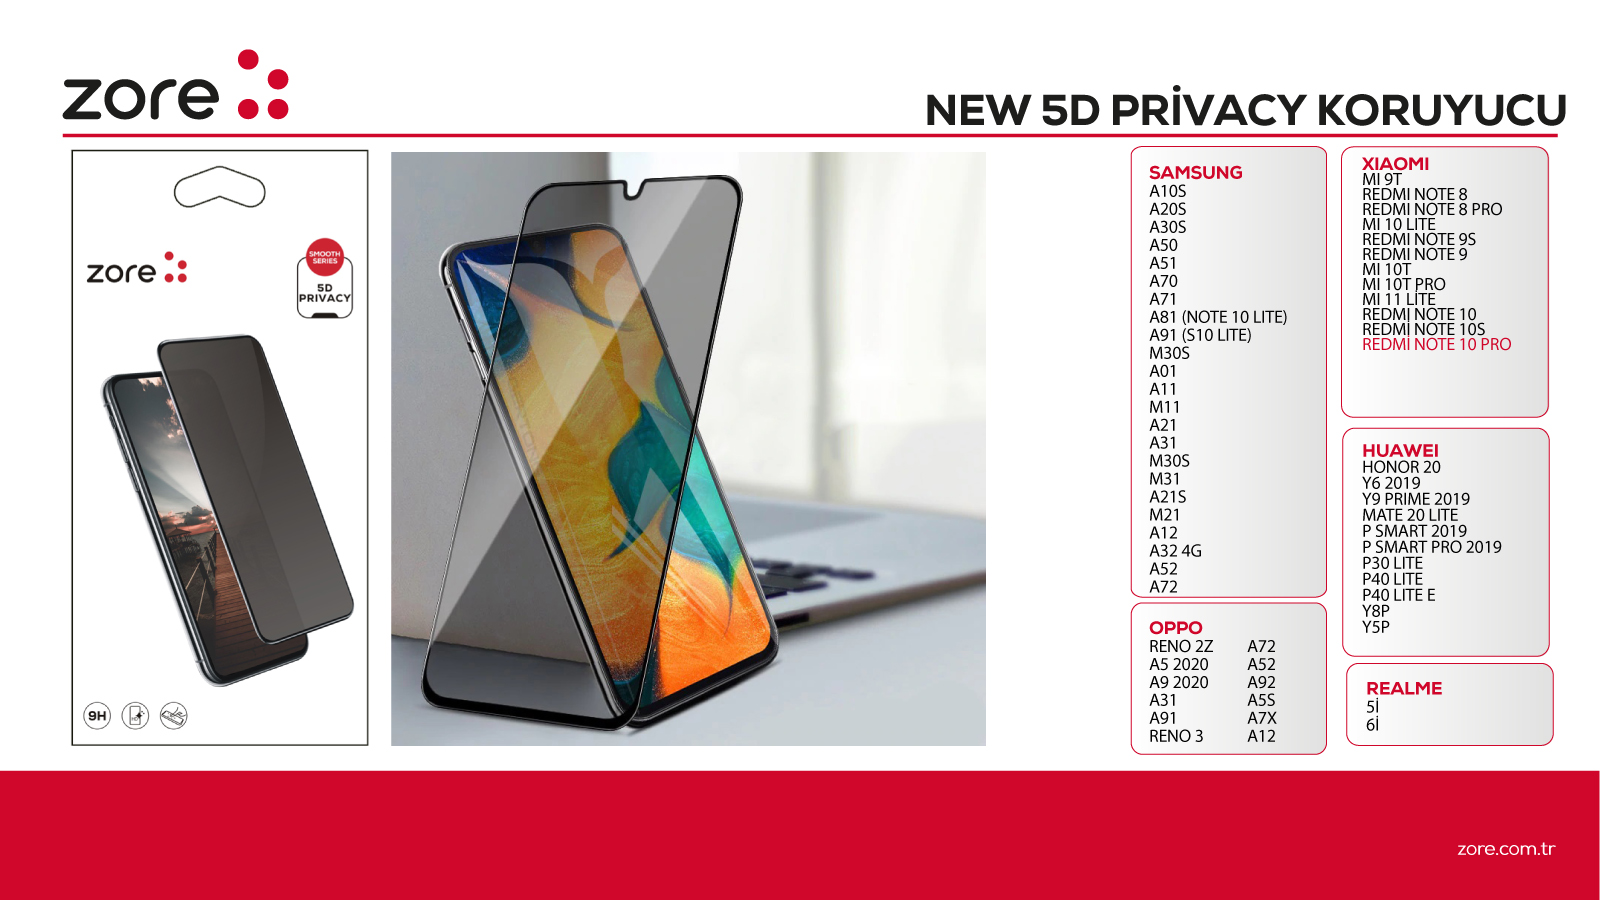 new_5d_privacy_koruyucu.jpg (519 KB)